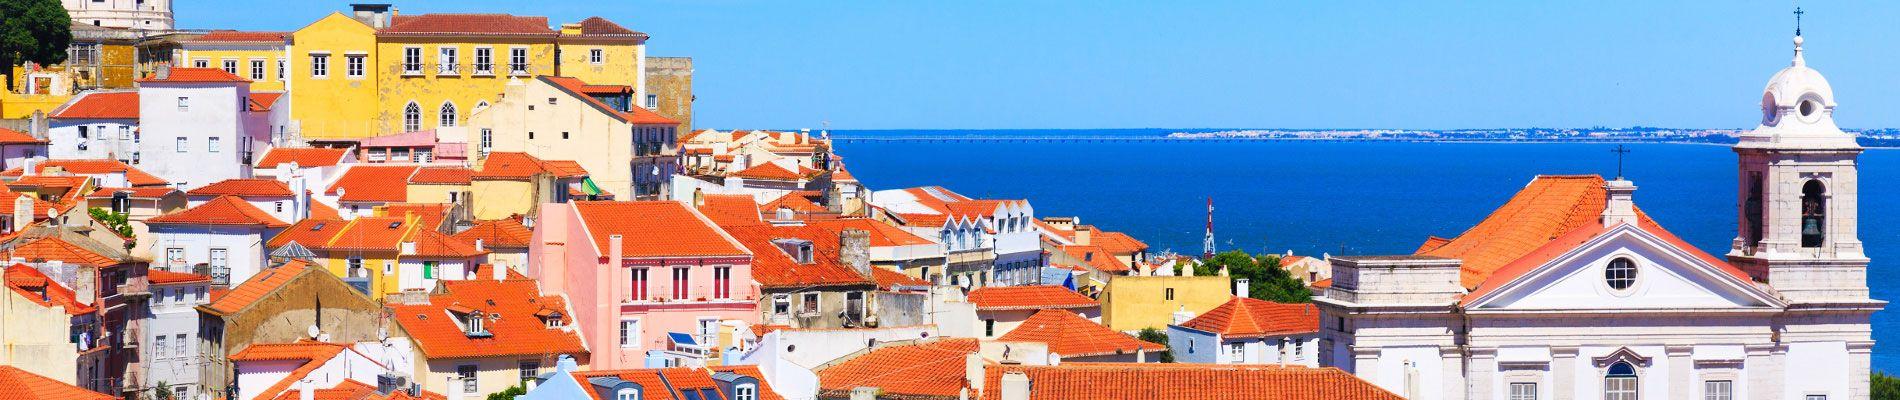 portugal-lisbonne-paysage(1)